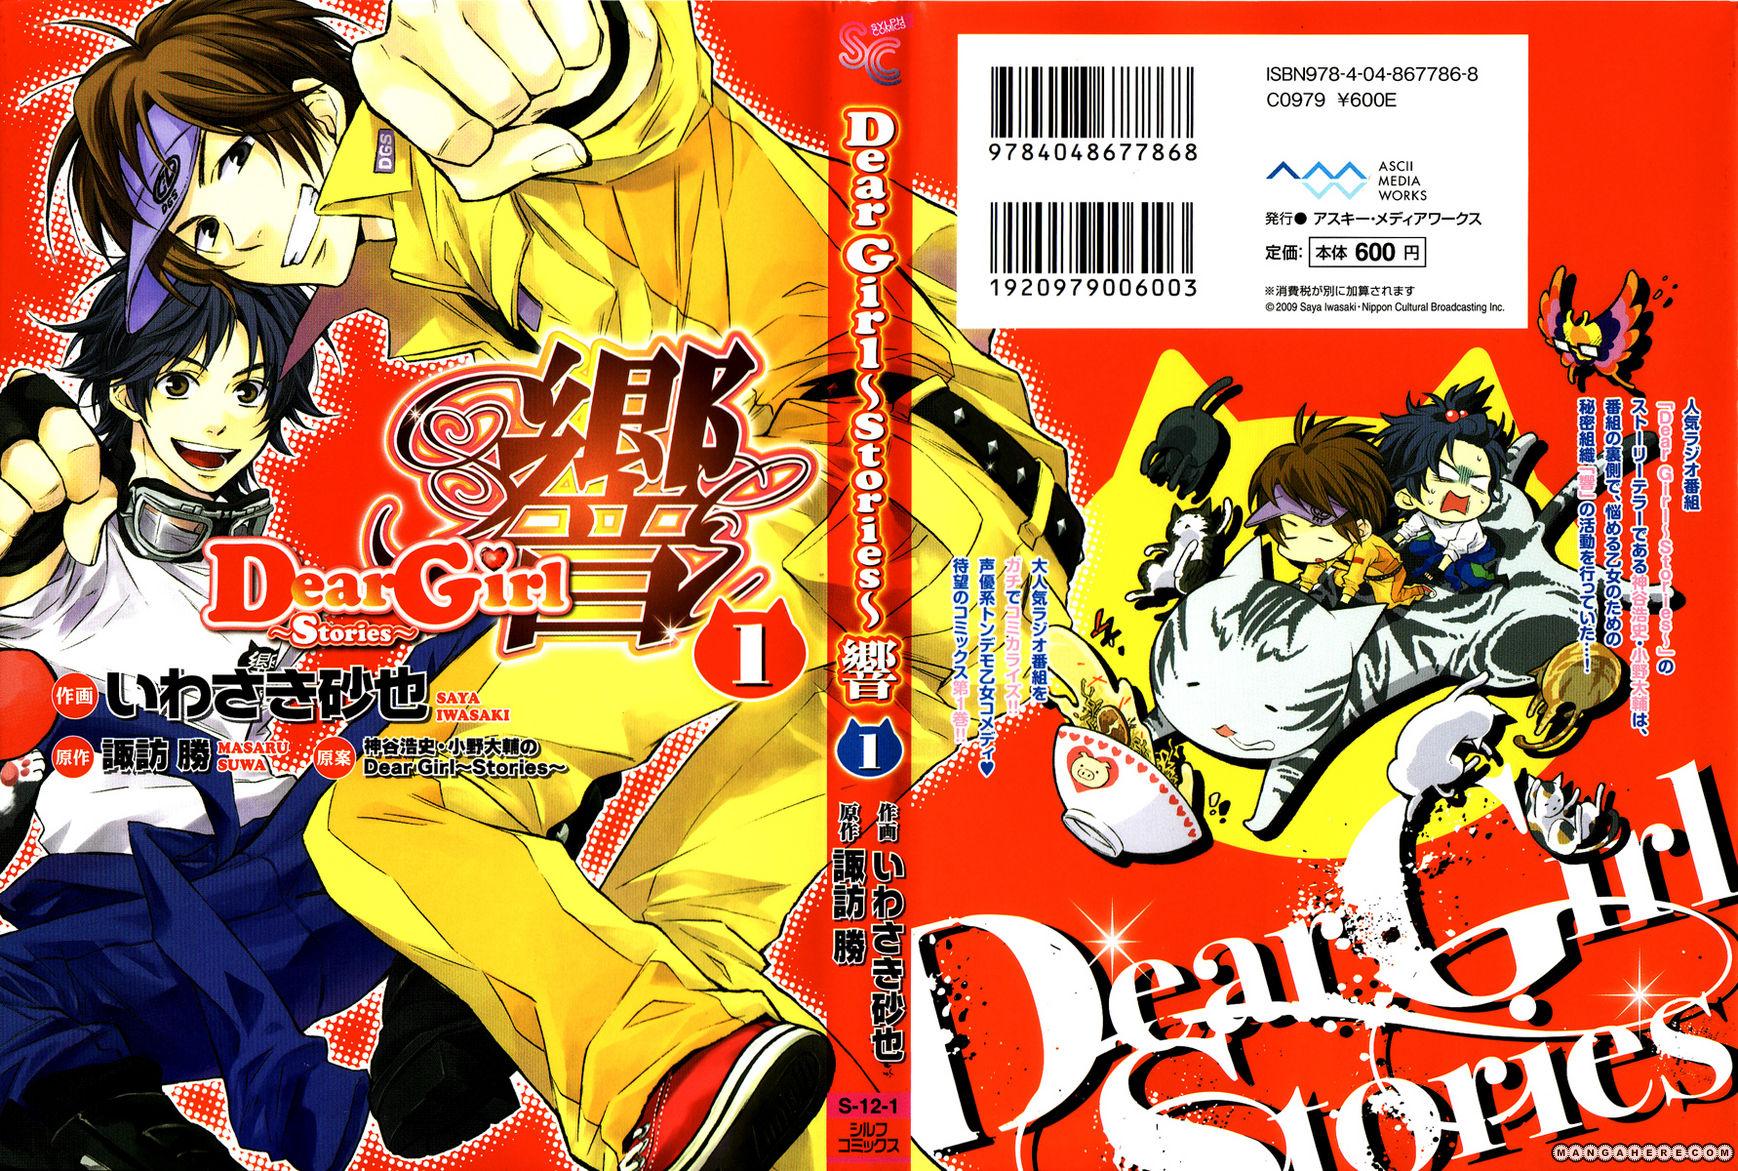 Dear Girl - Stories - Hibiki 1 Page 2